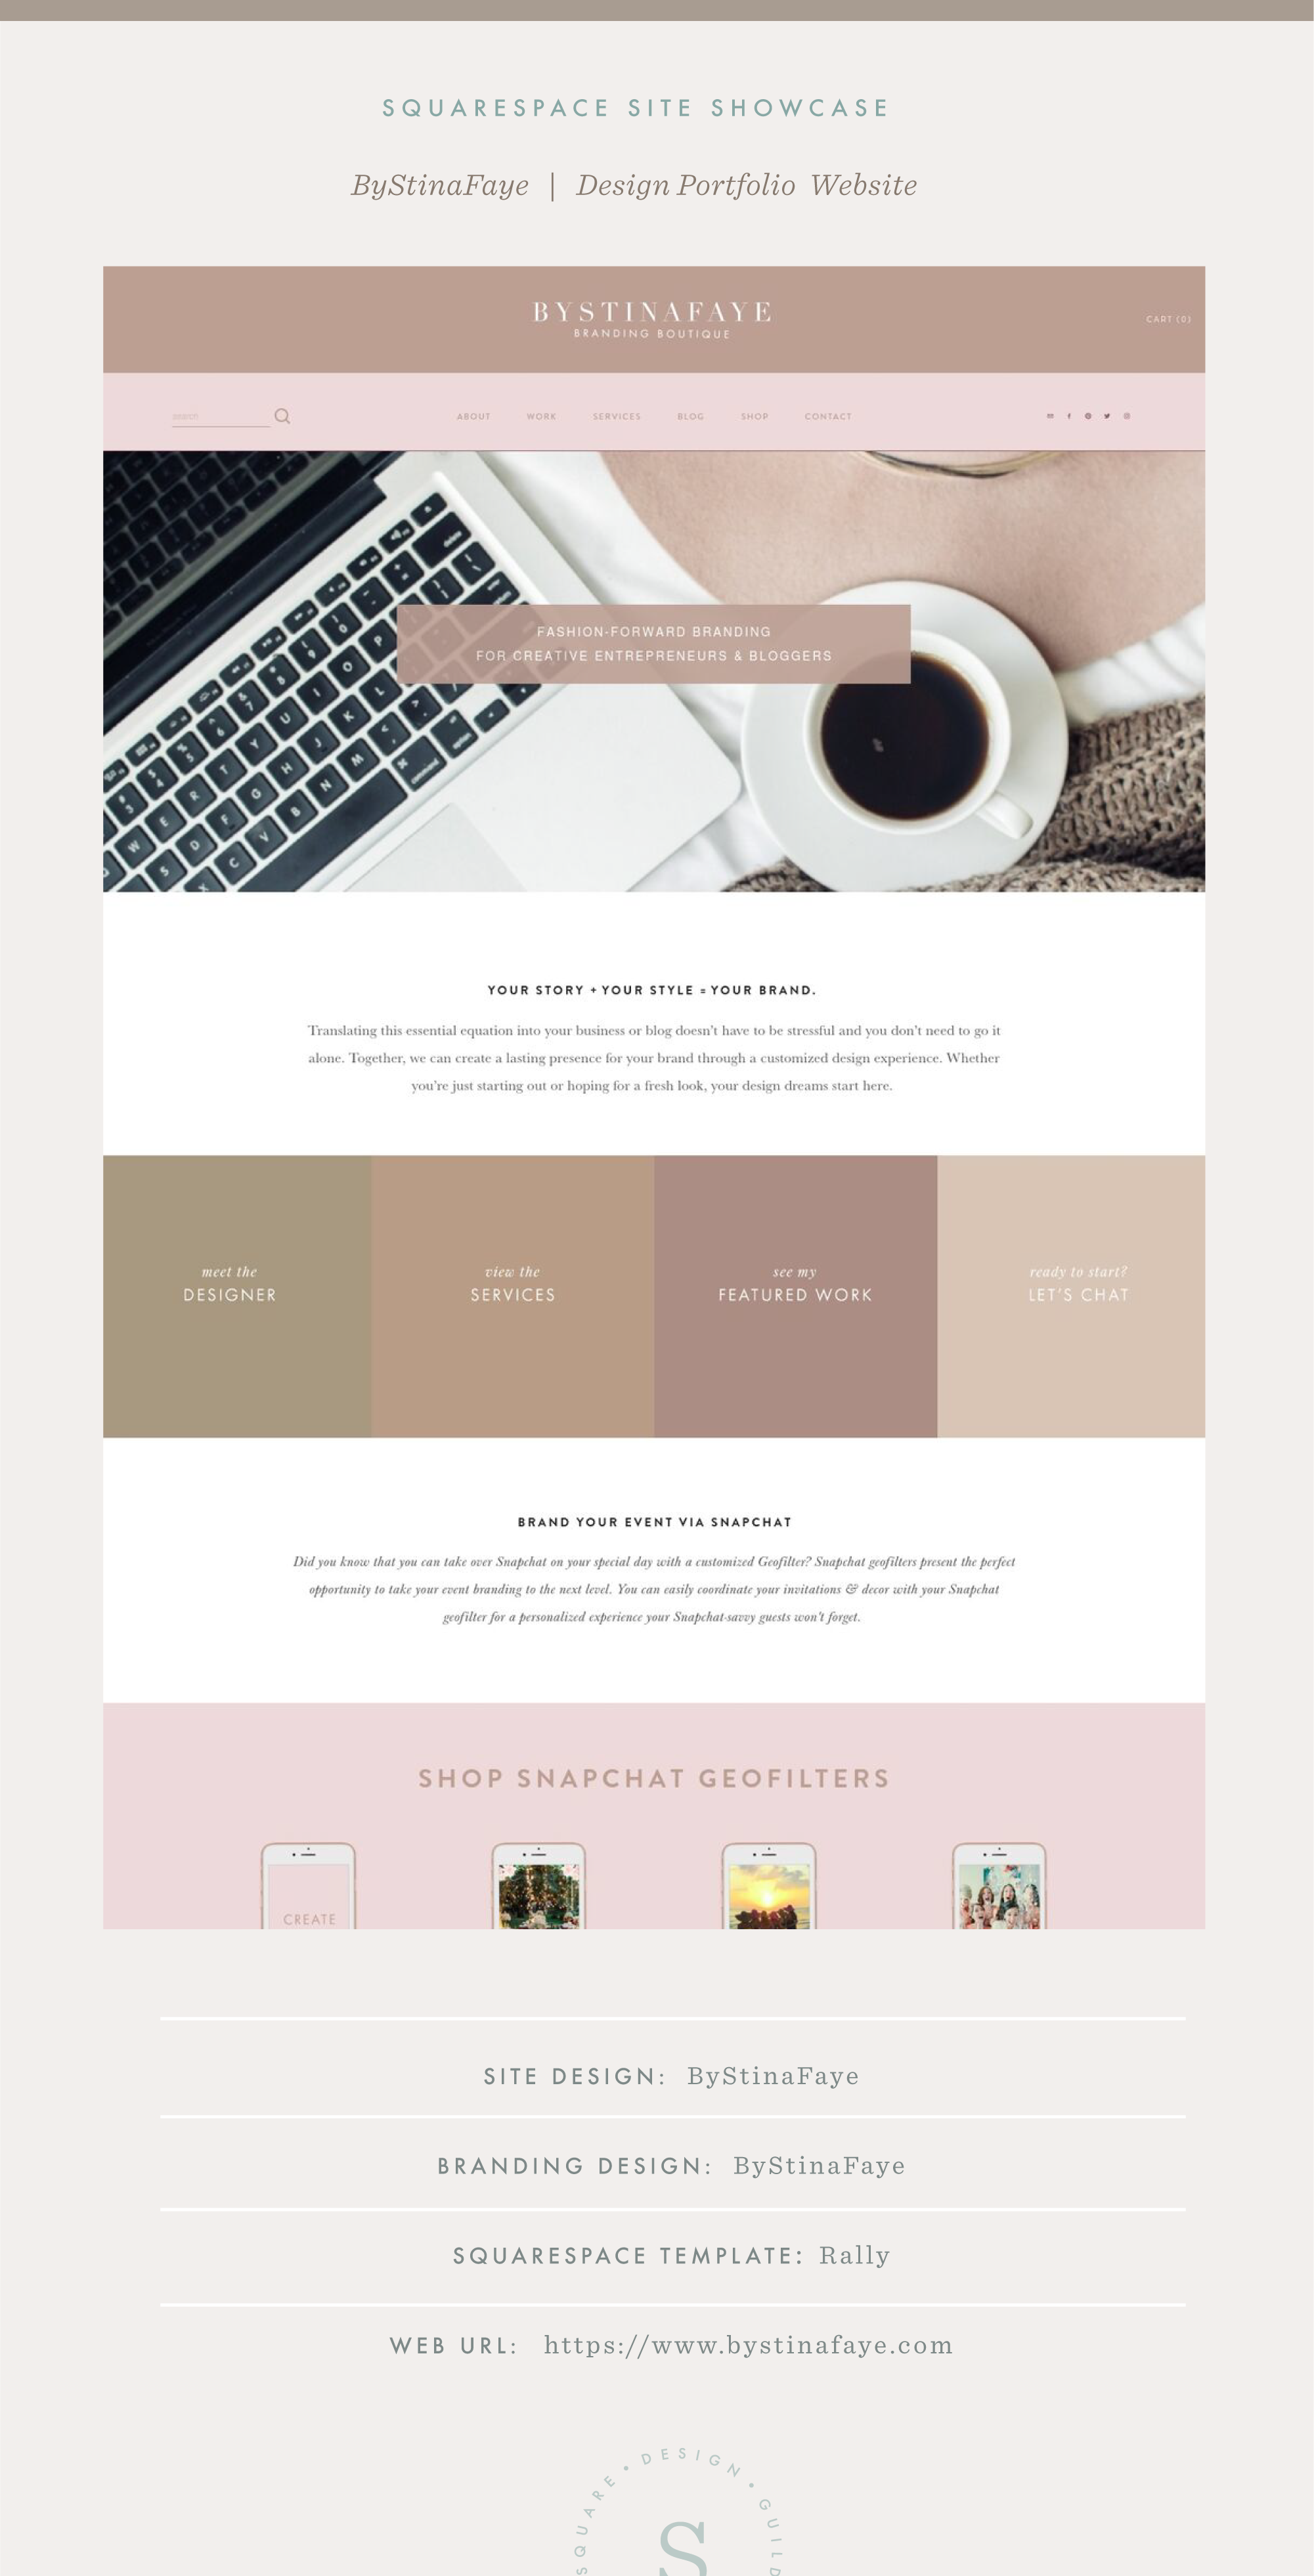 Square Design Guild | Squarespace Site Showcase: ByStinaFaye Portfolio Design Website